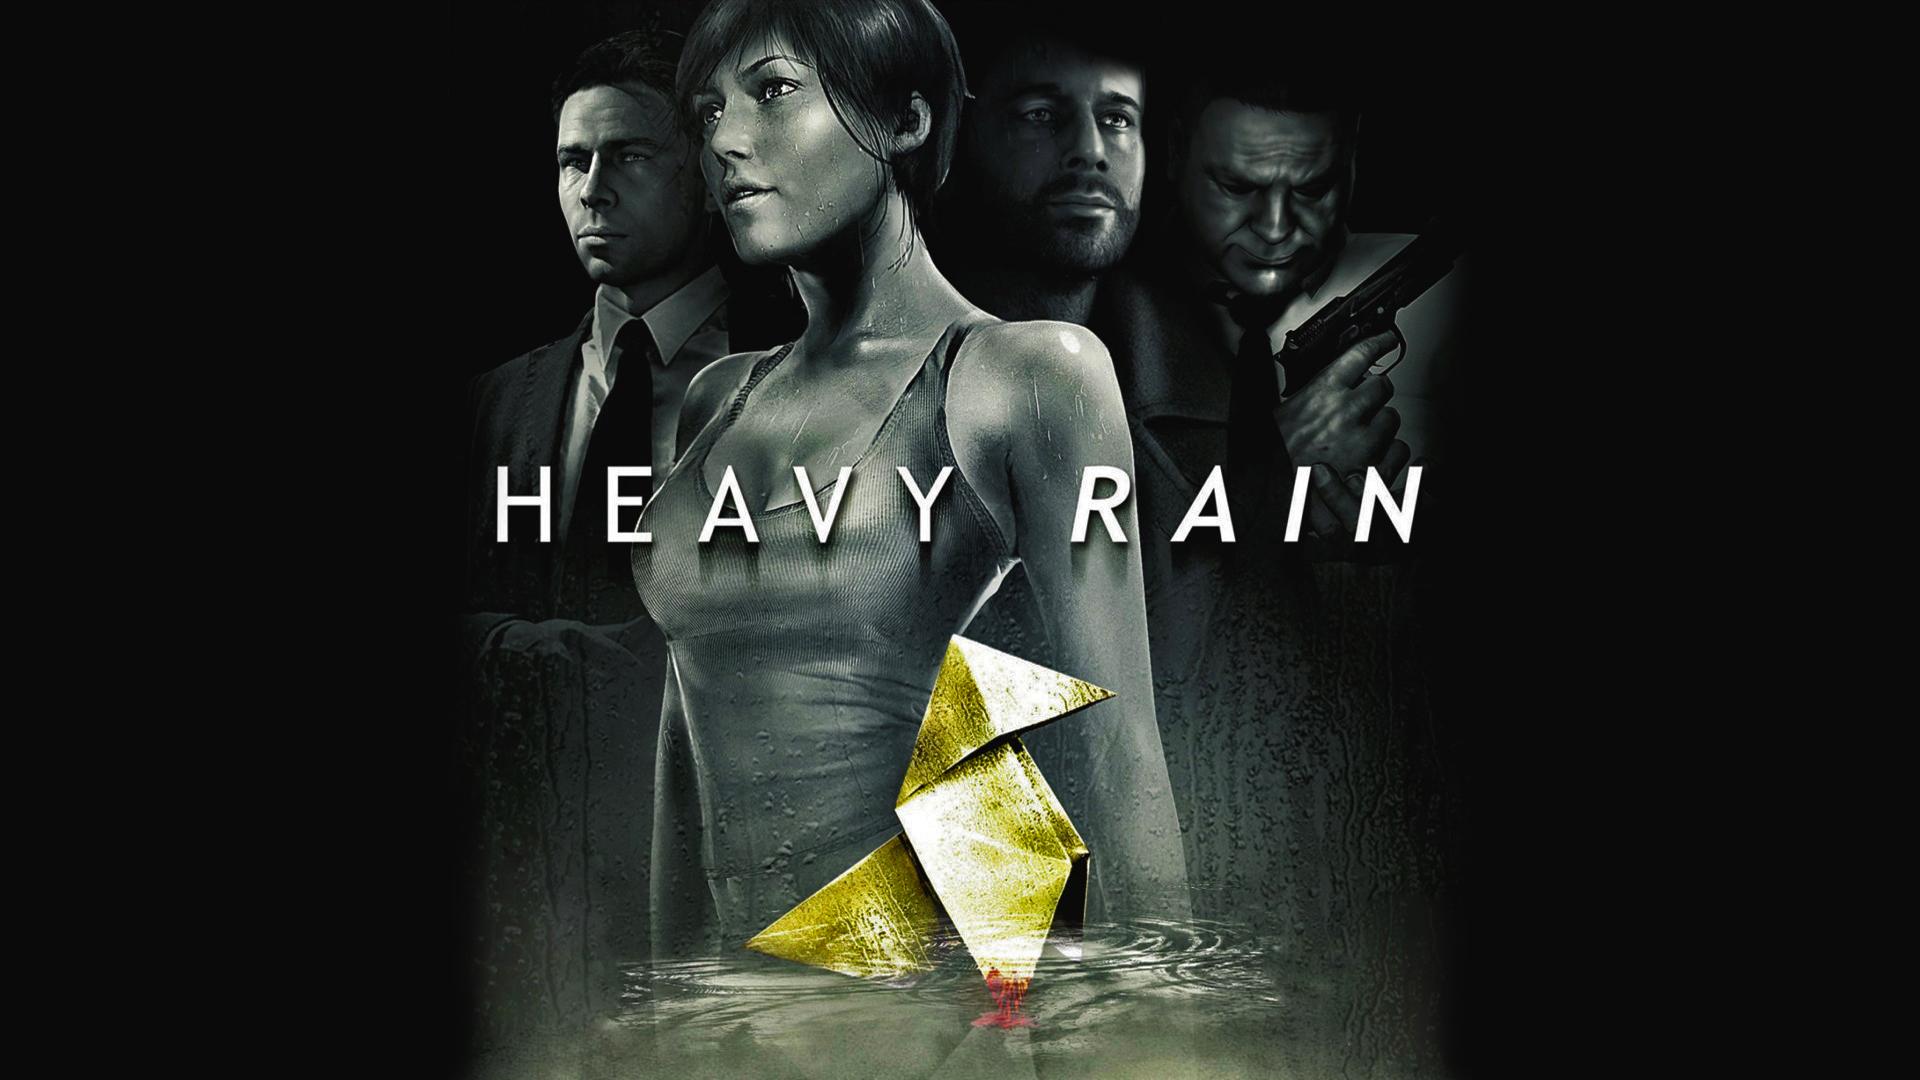 Heay Rain to pour down the big screen